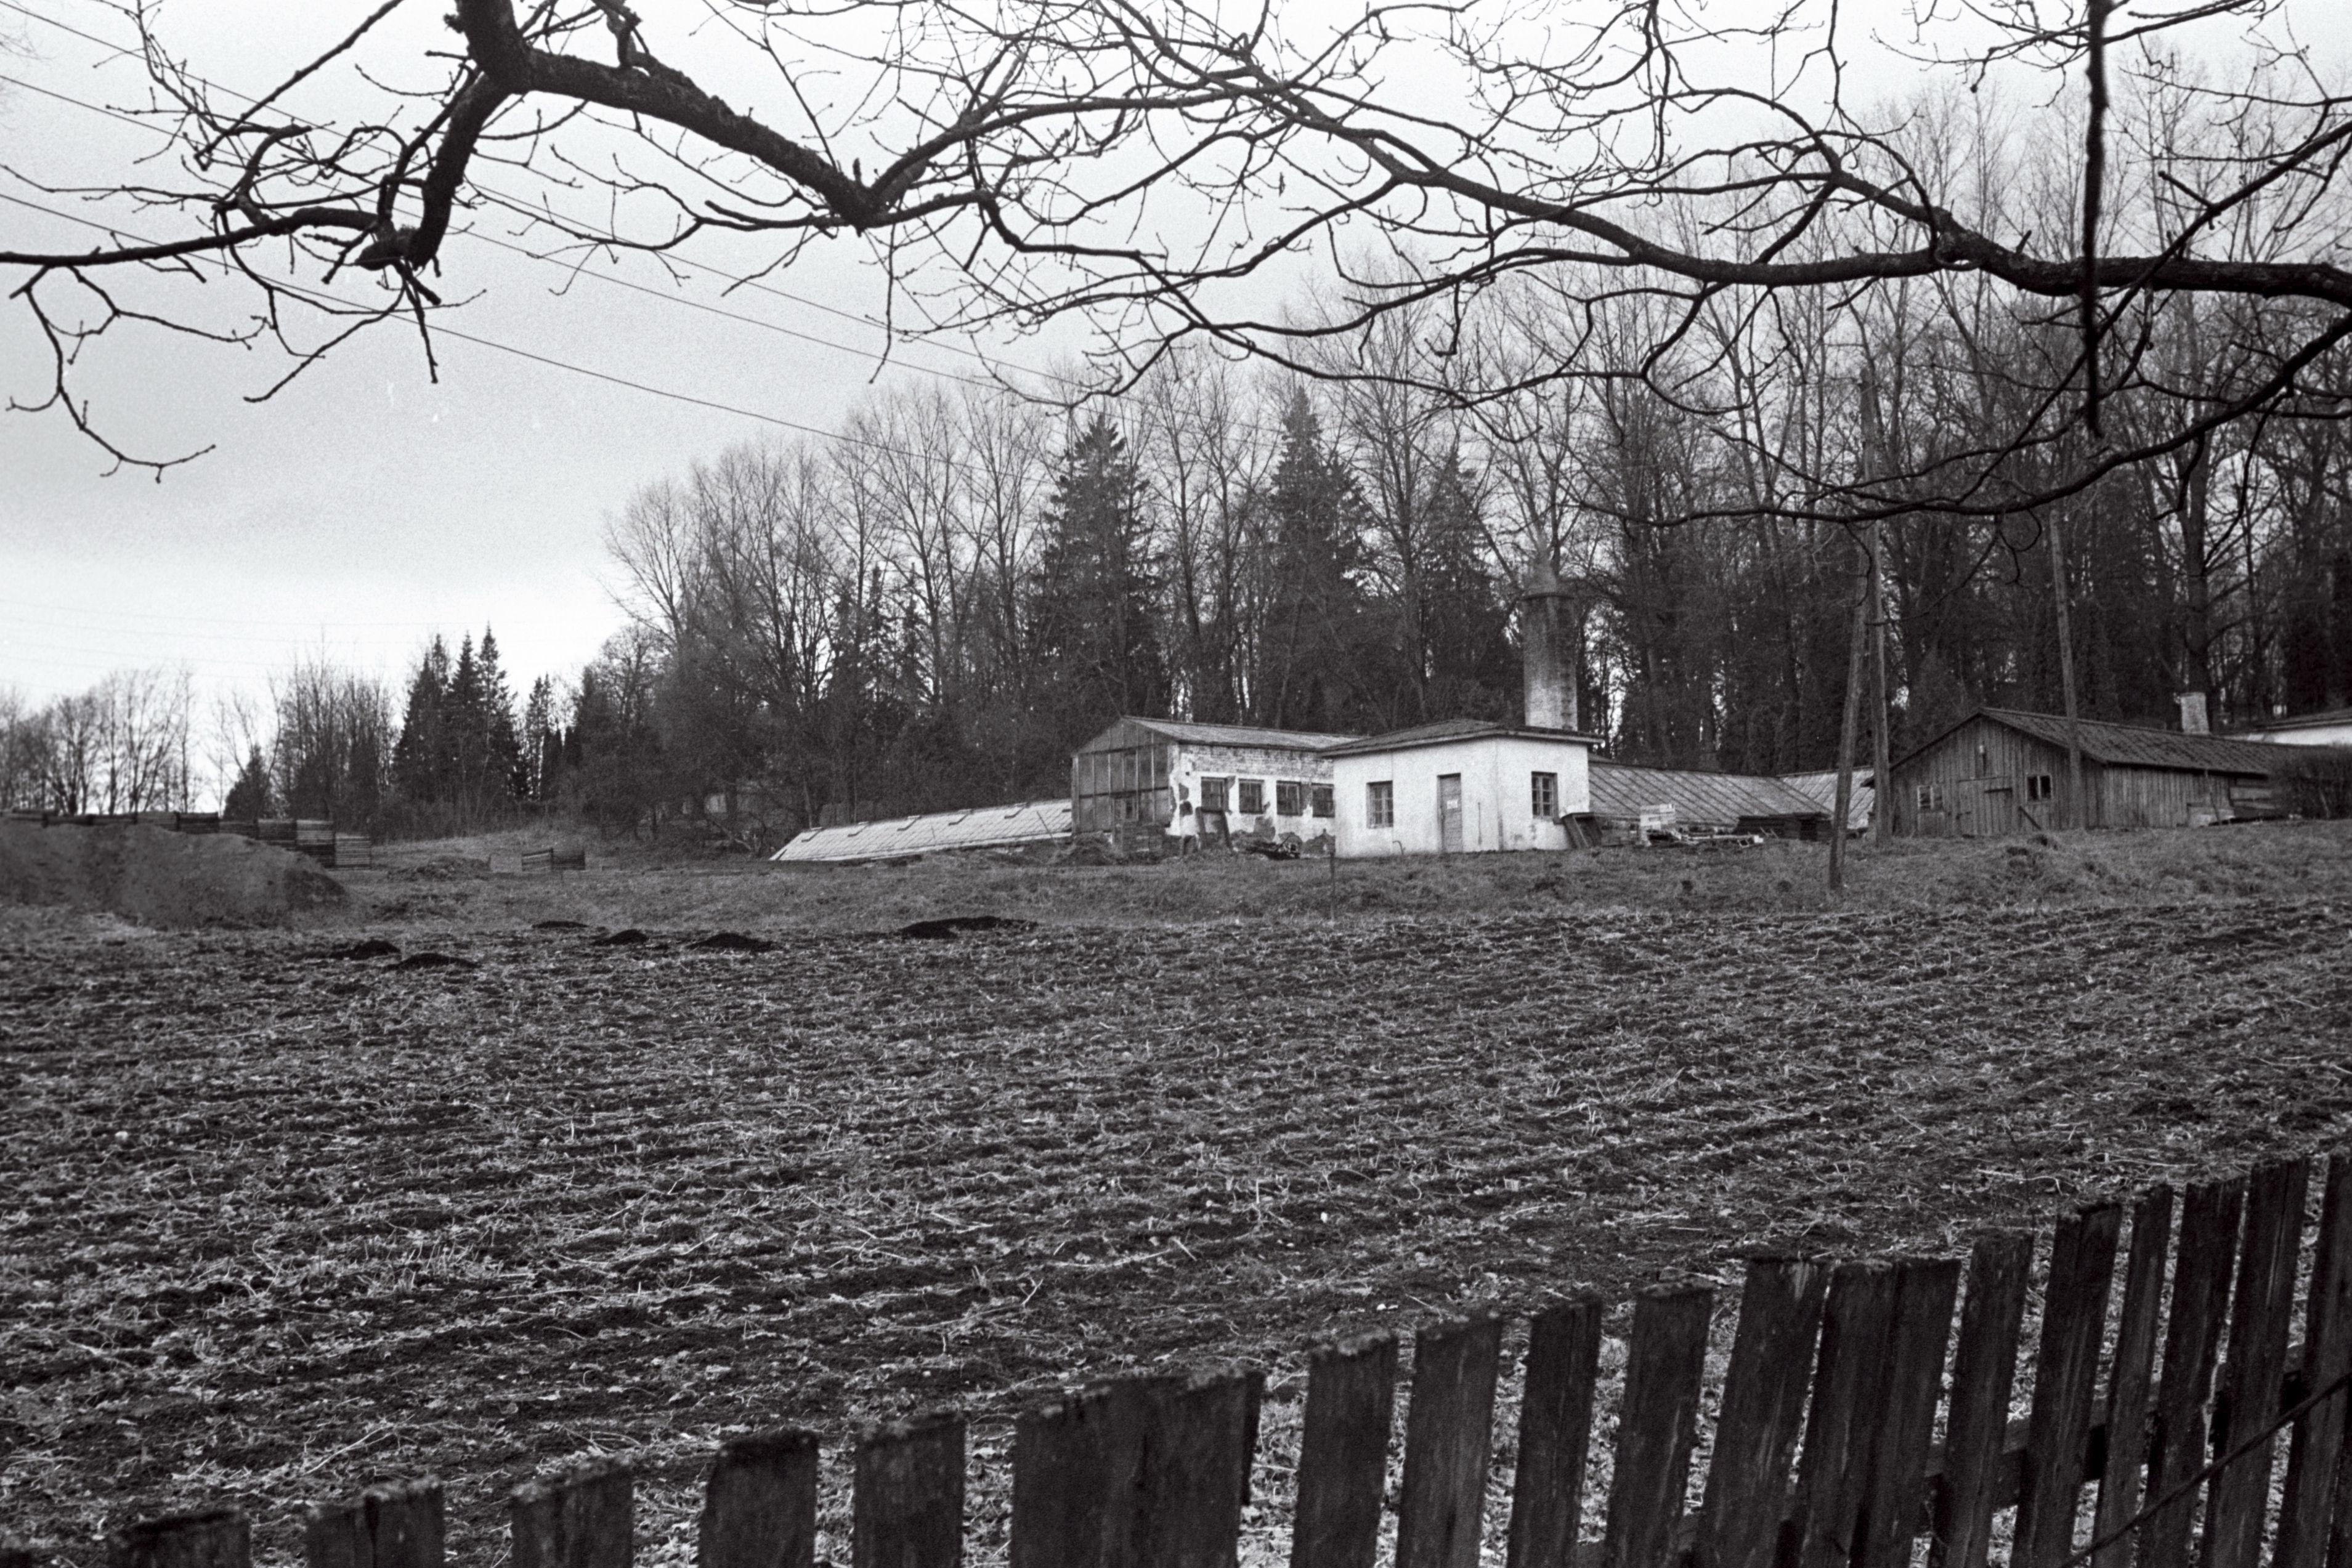 Viljandi Valuoja aiand, tulevane ehitusplats, aprill 1975. EFA.508.0-170322 . 35mm negatiivfilm